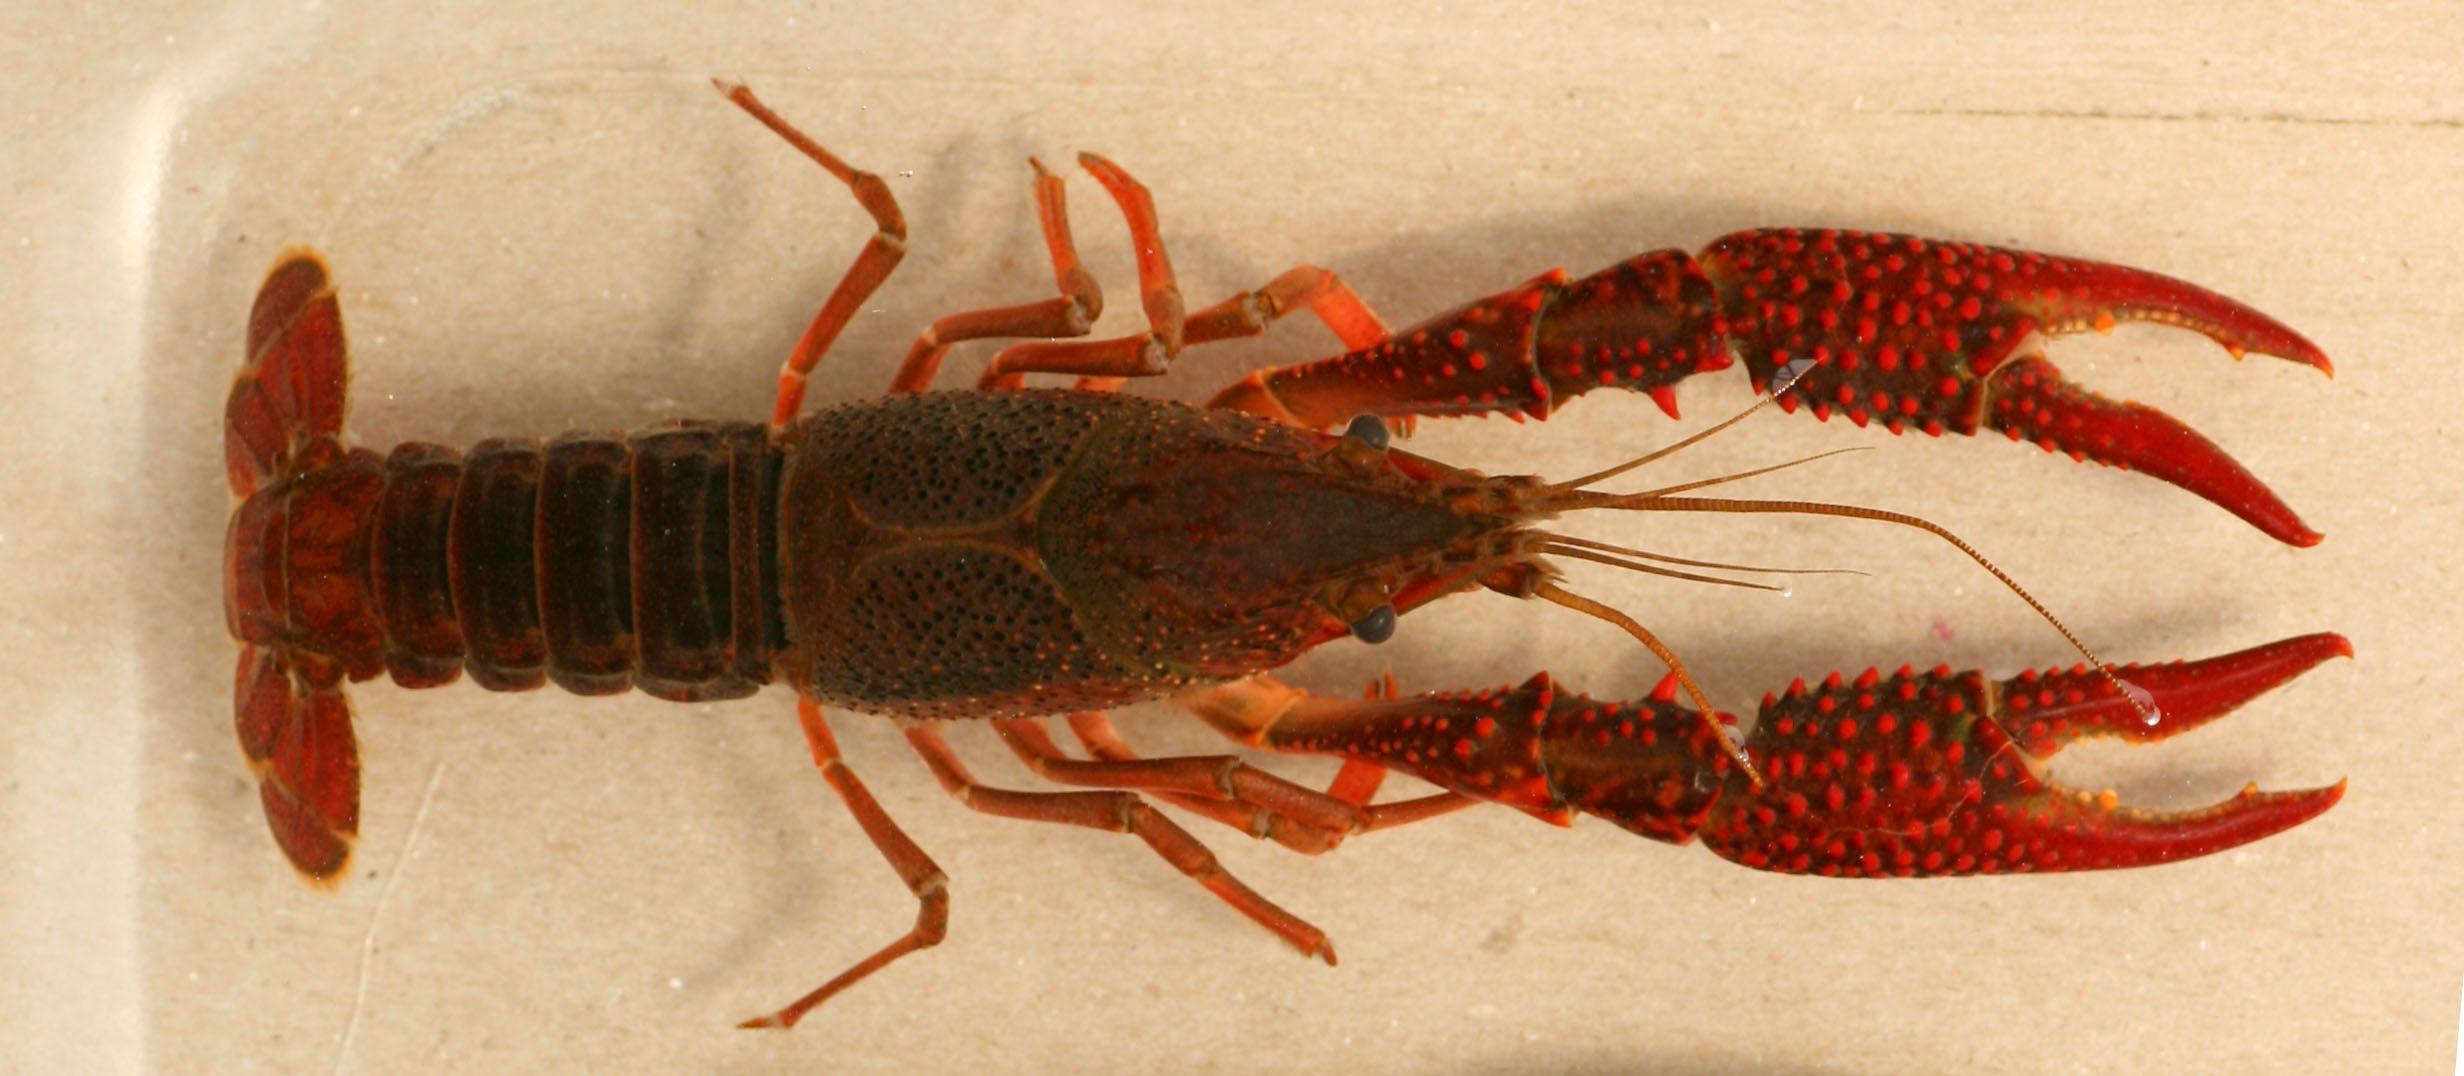 Where are crayfish found